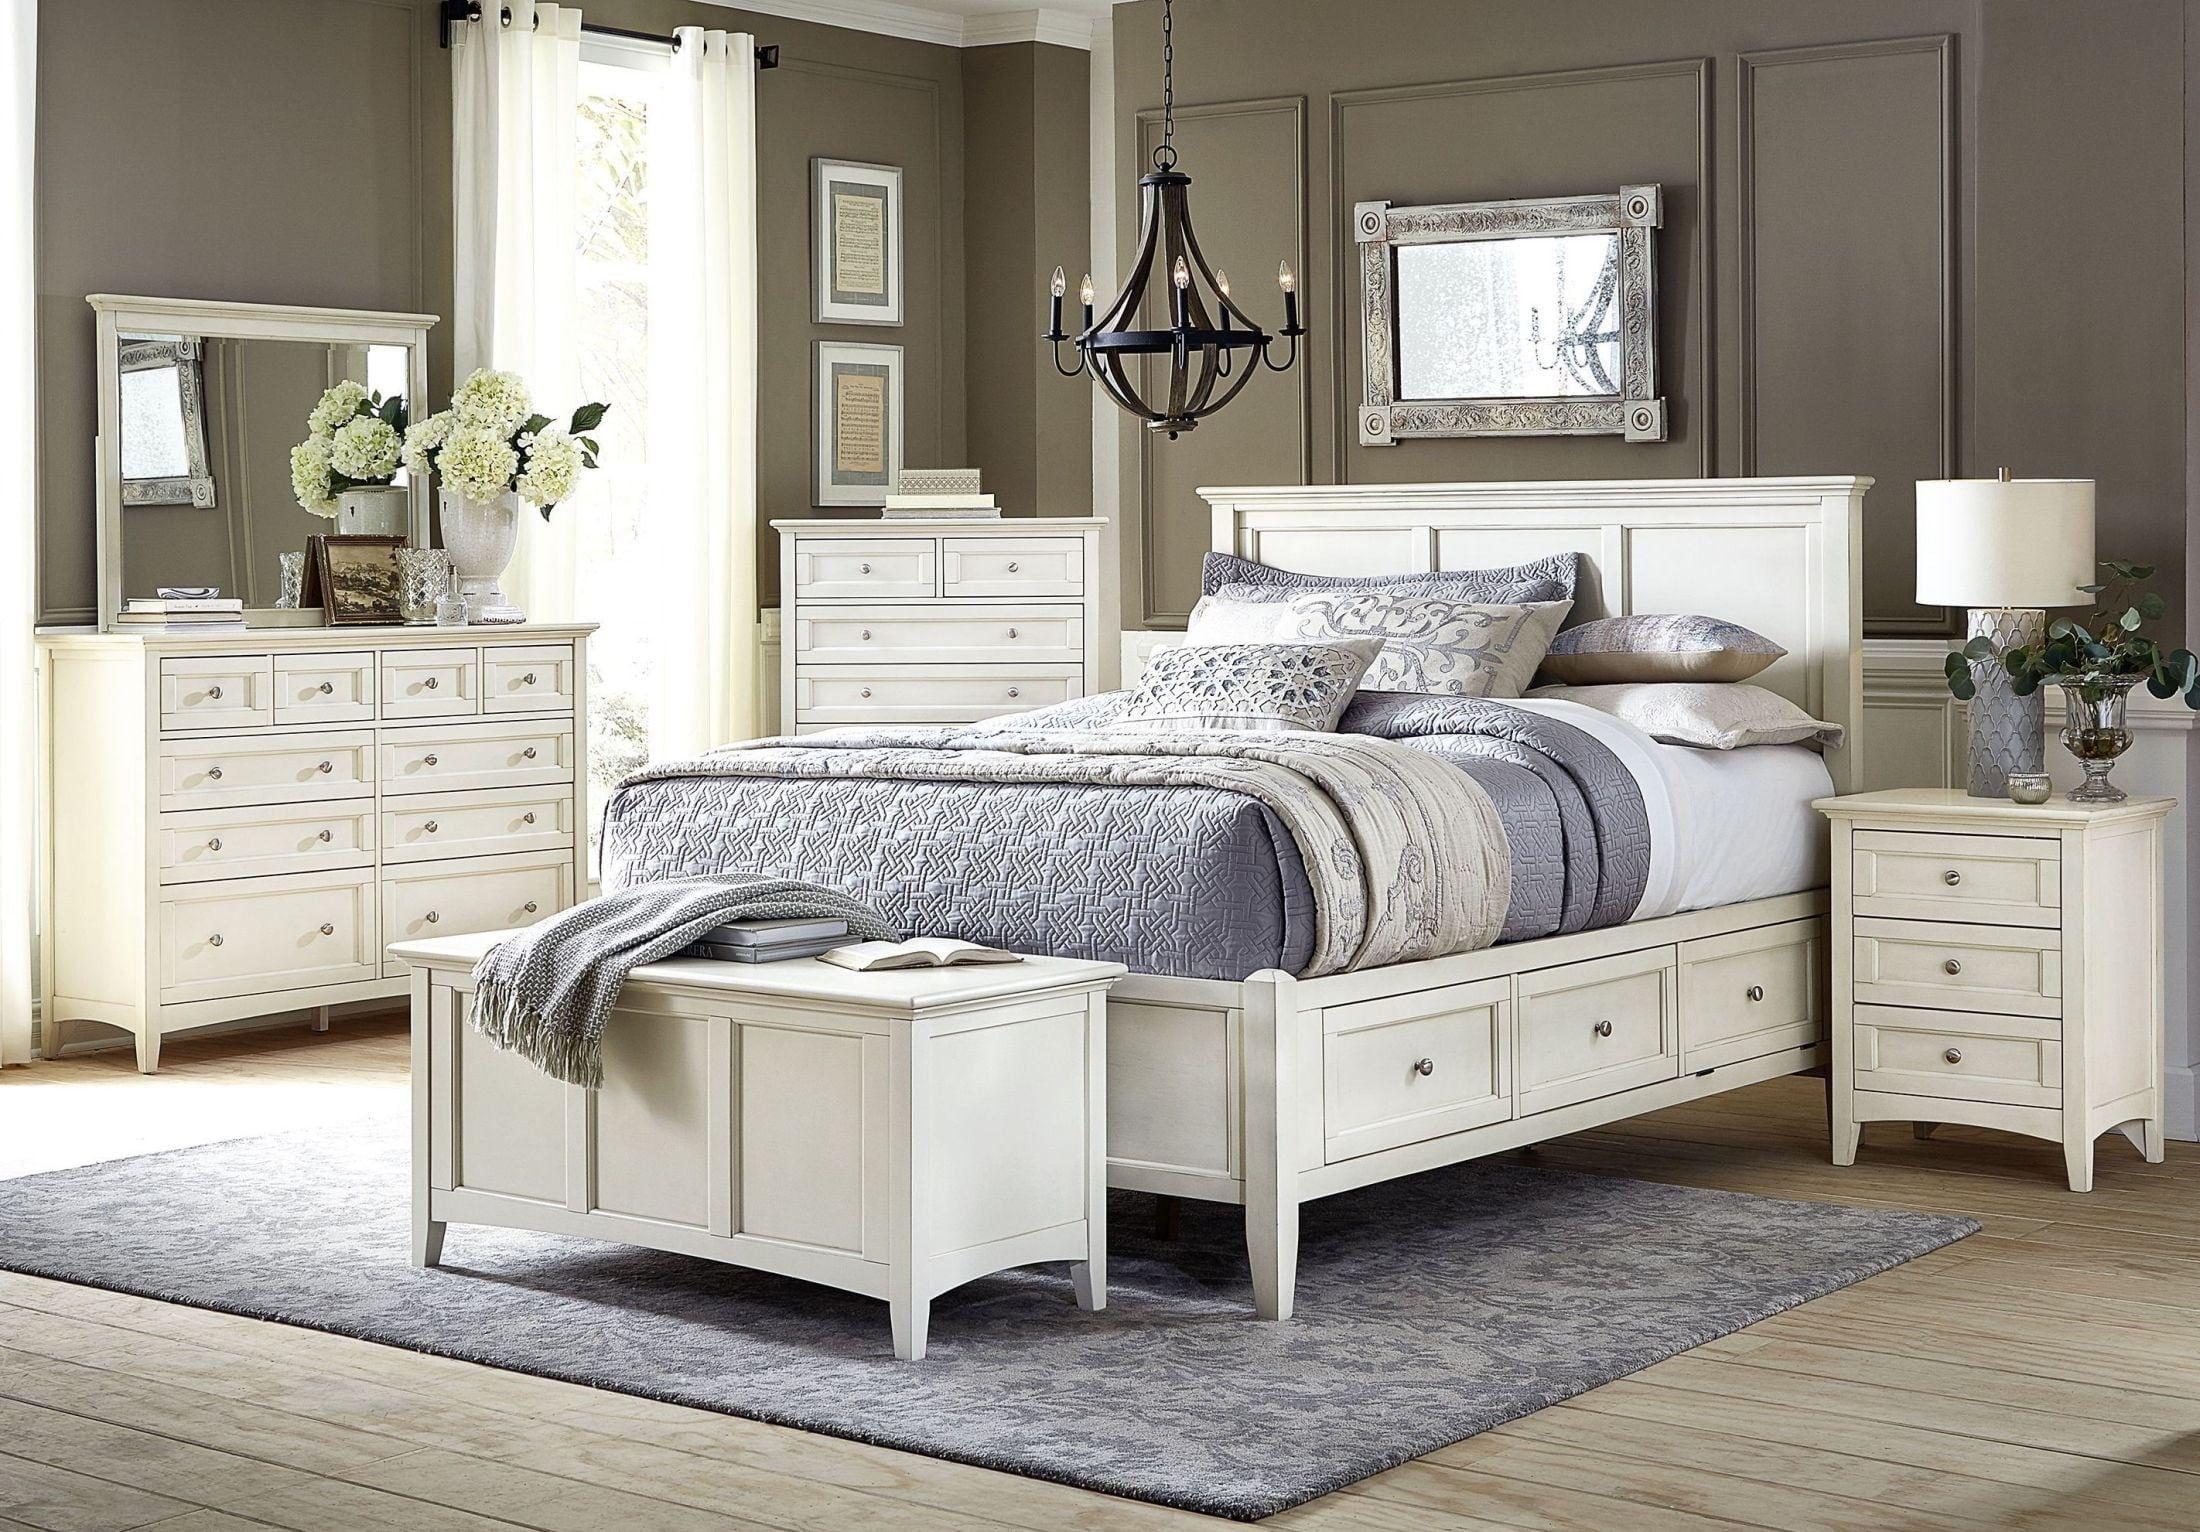 Hancock Park Wood Panel Bed in Vintage White by Magnussen